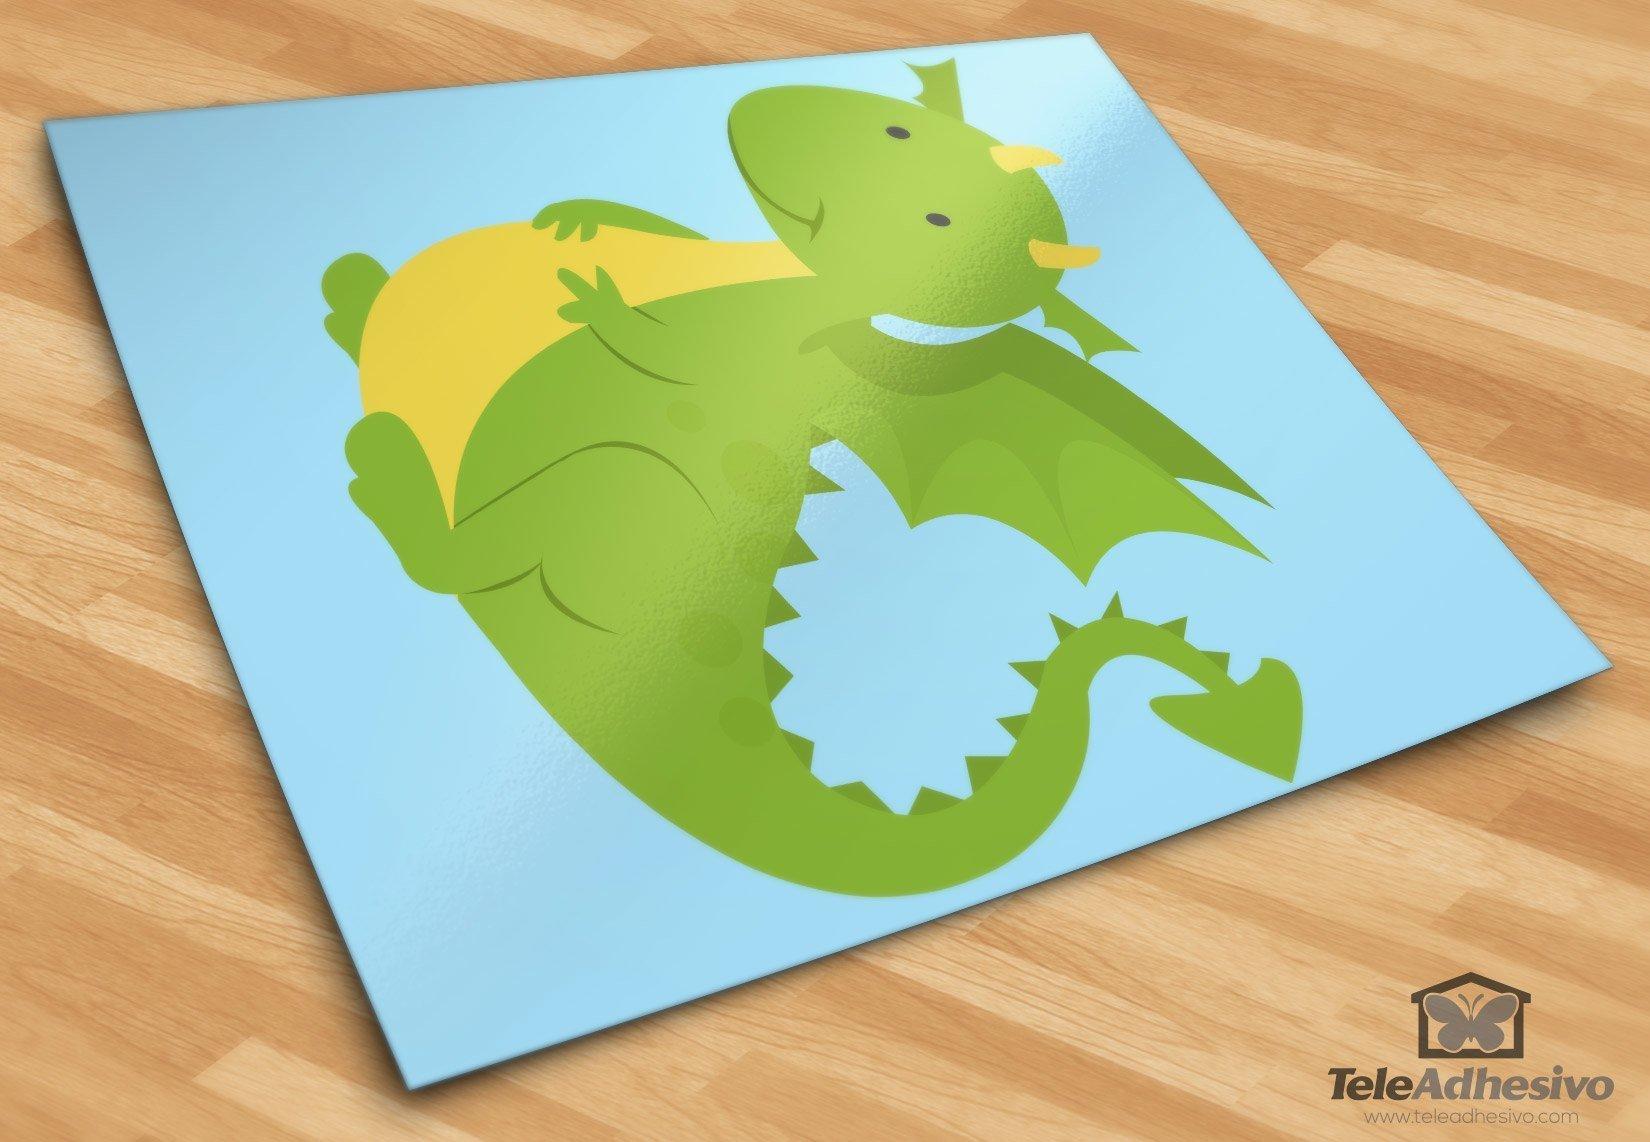 Kinderzimmer Wandtattoo: Drachen